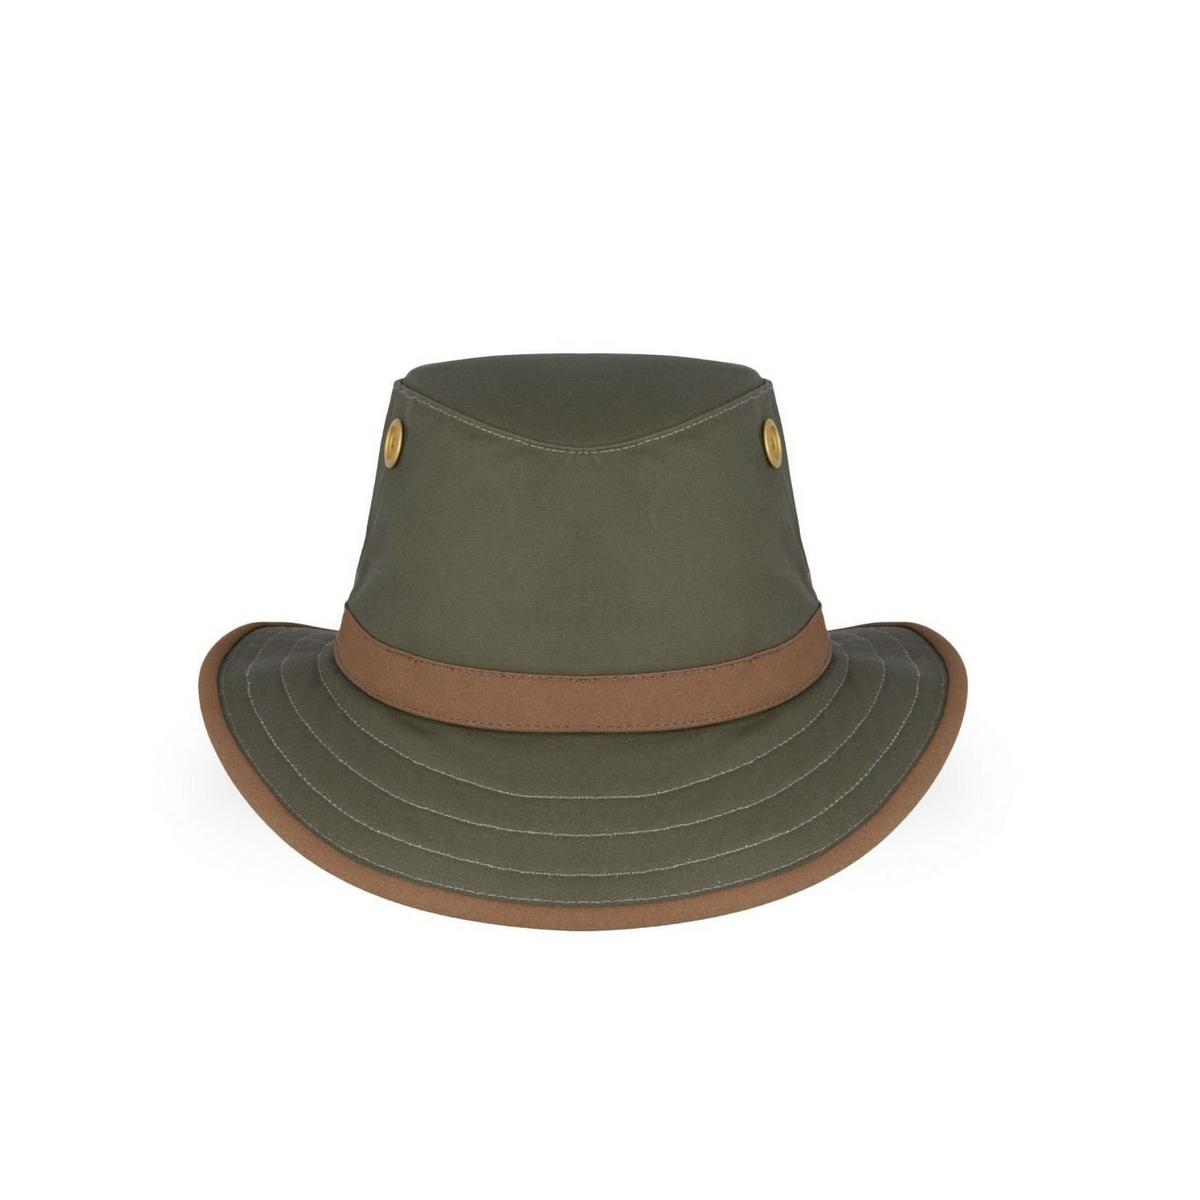 Tilley Endurables TWC7 Medium Brim Hat - Green